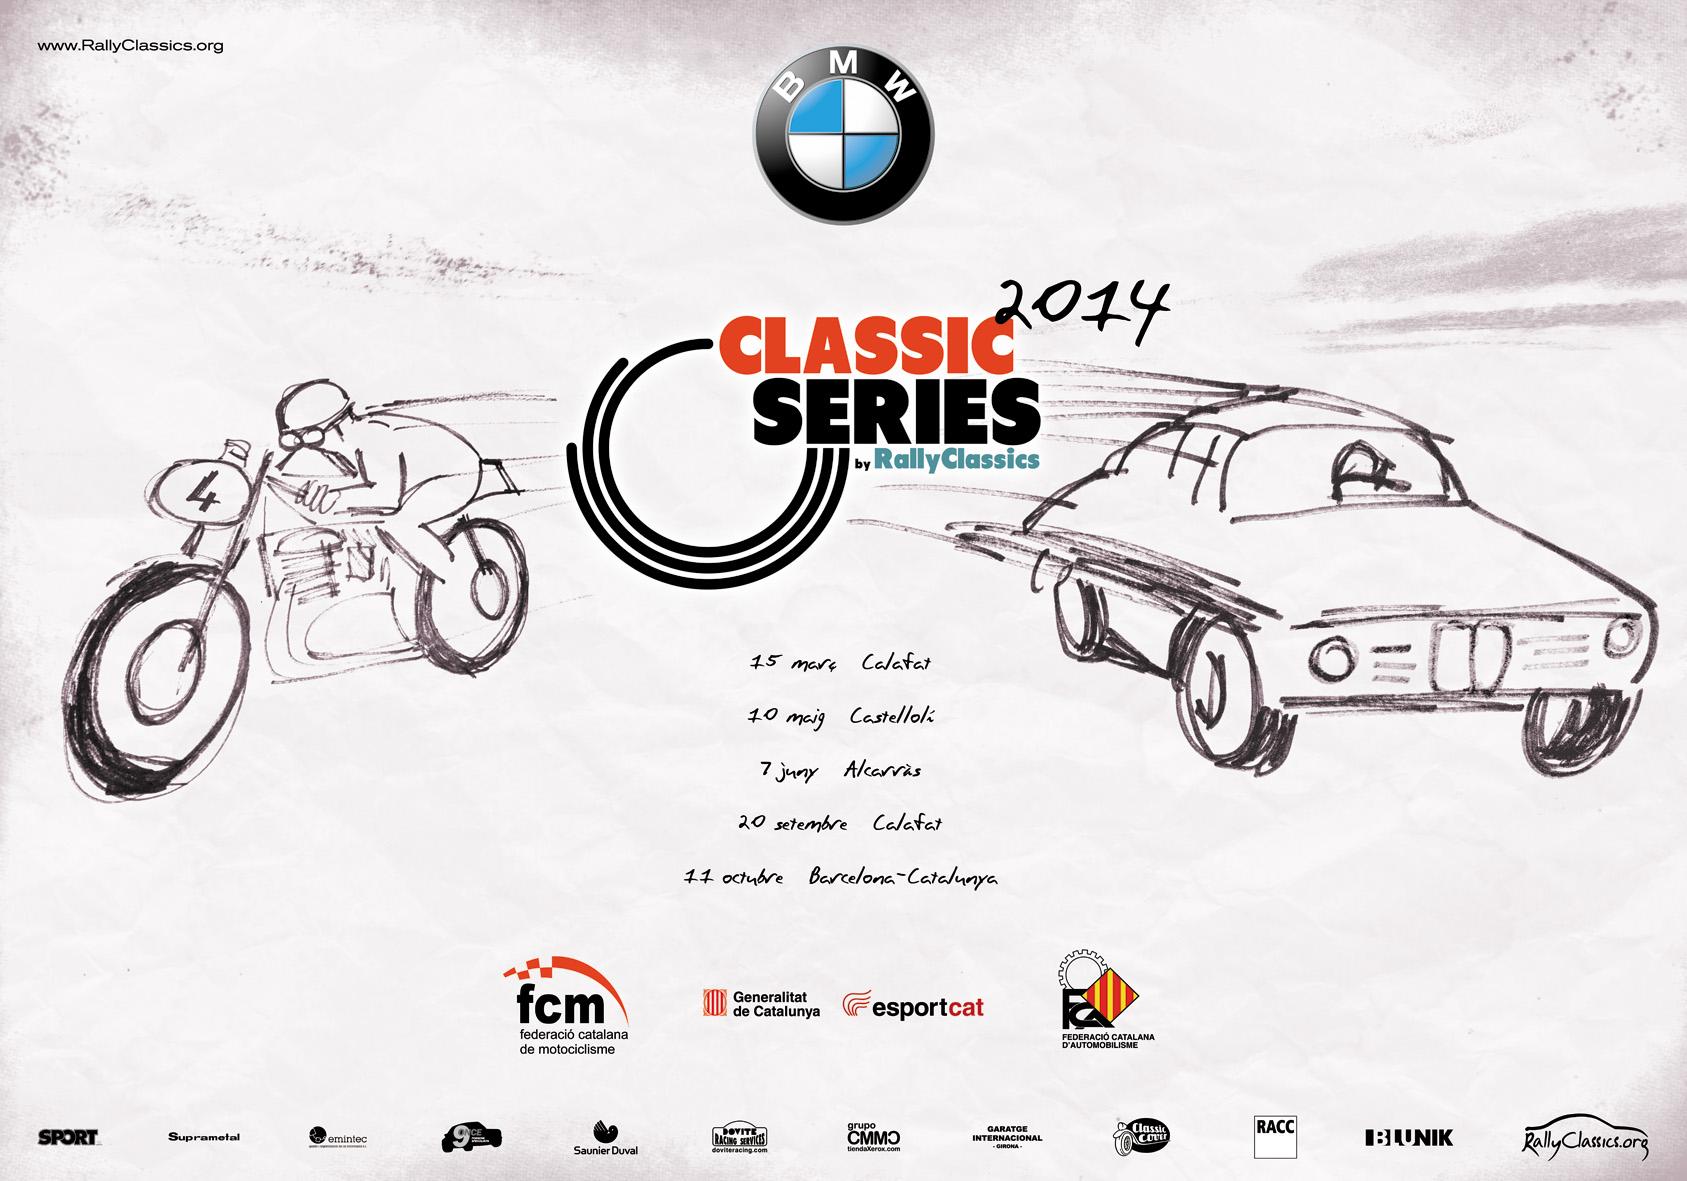 ClassicSeries2014